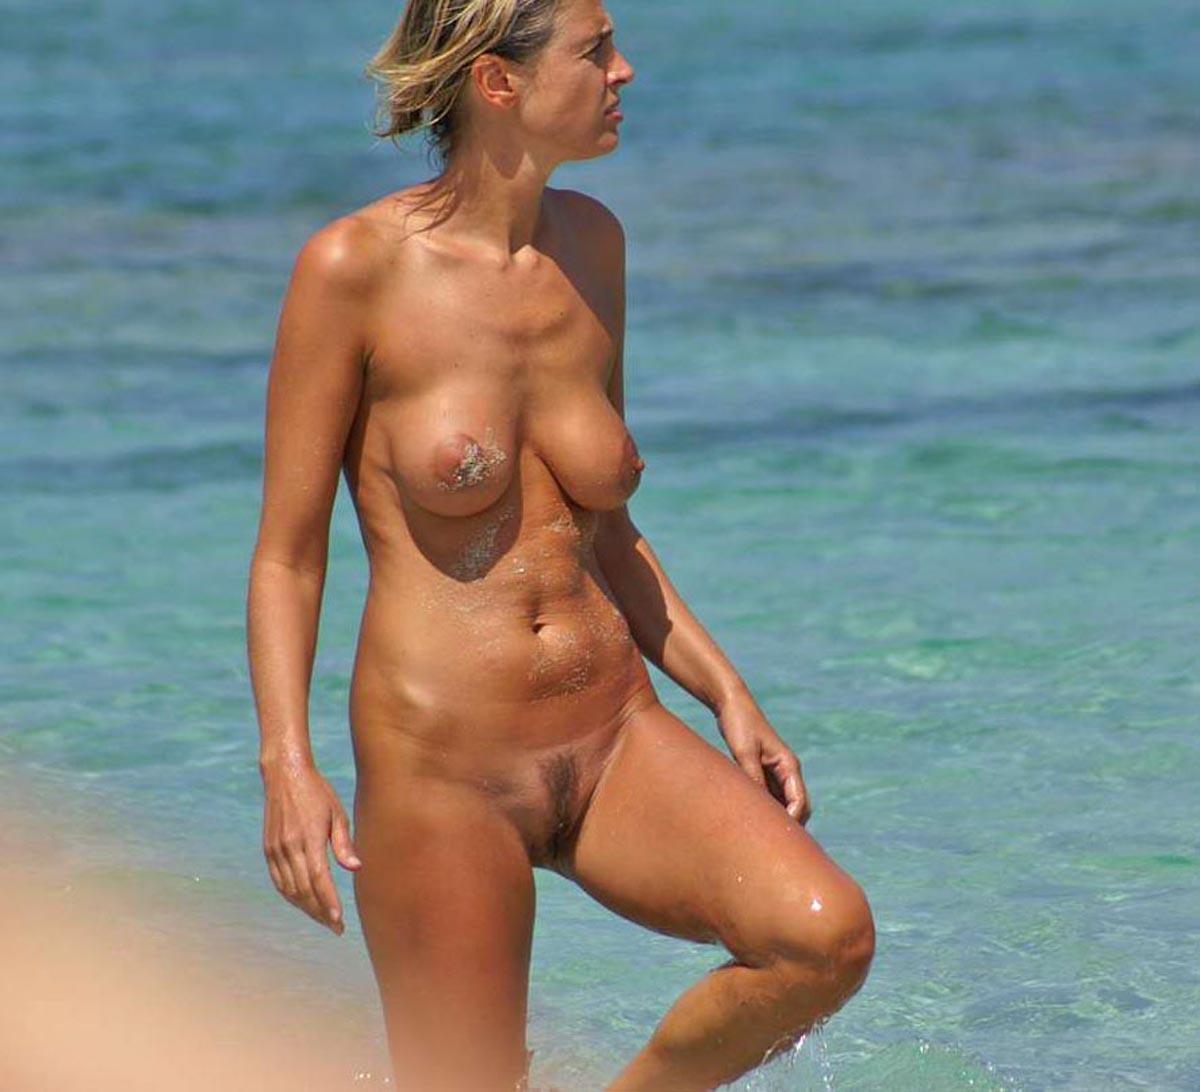 girlfriend shy topless beach